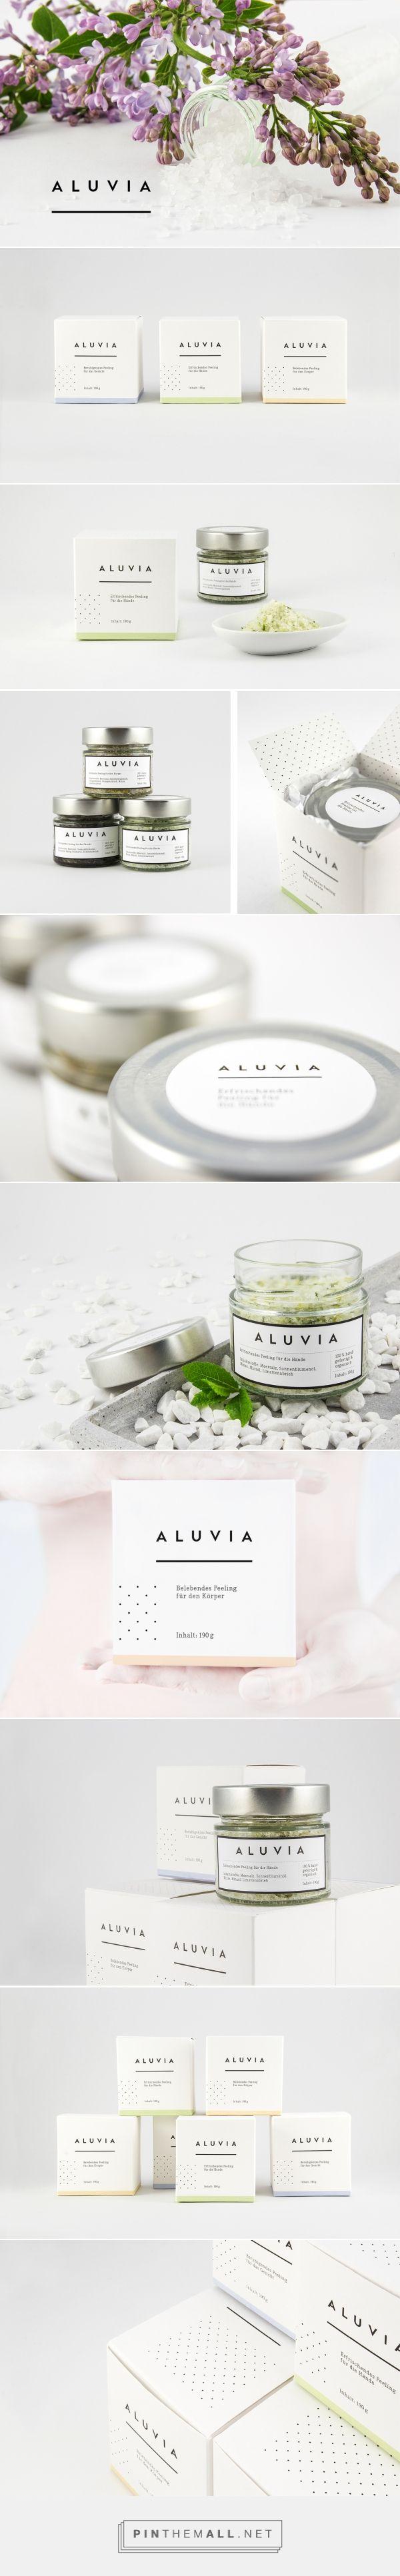 Aluvia // natural exfoliants for the body